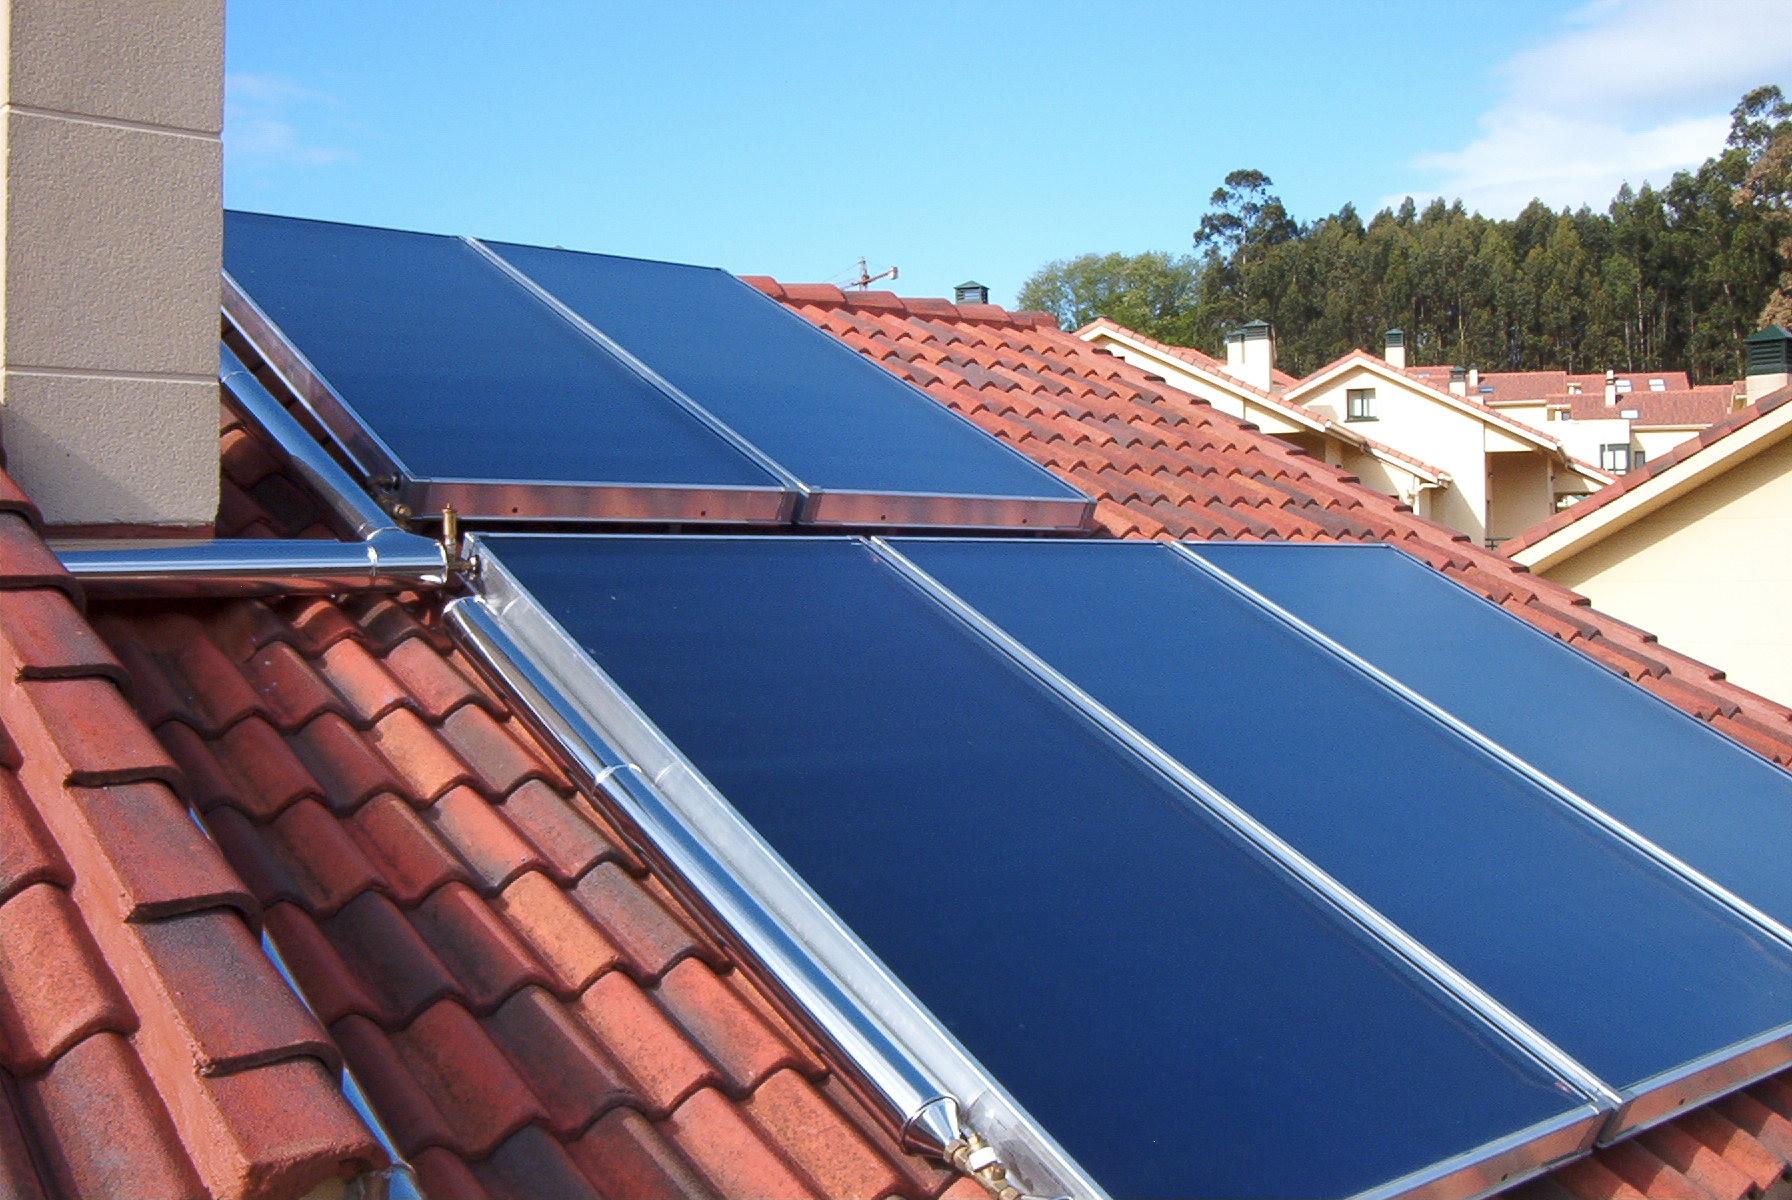 http://www.gasfriocalor.com/images/SMM/Energ%C3%ADa-solar-t%C3%A9rmica.jpg